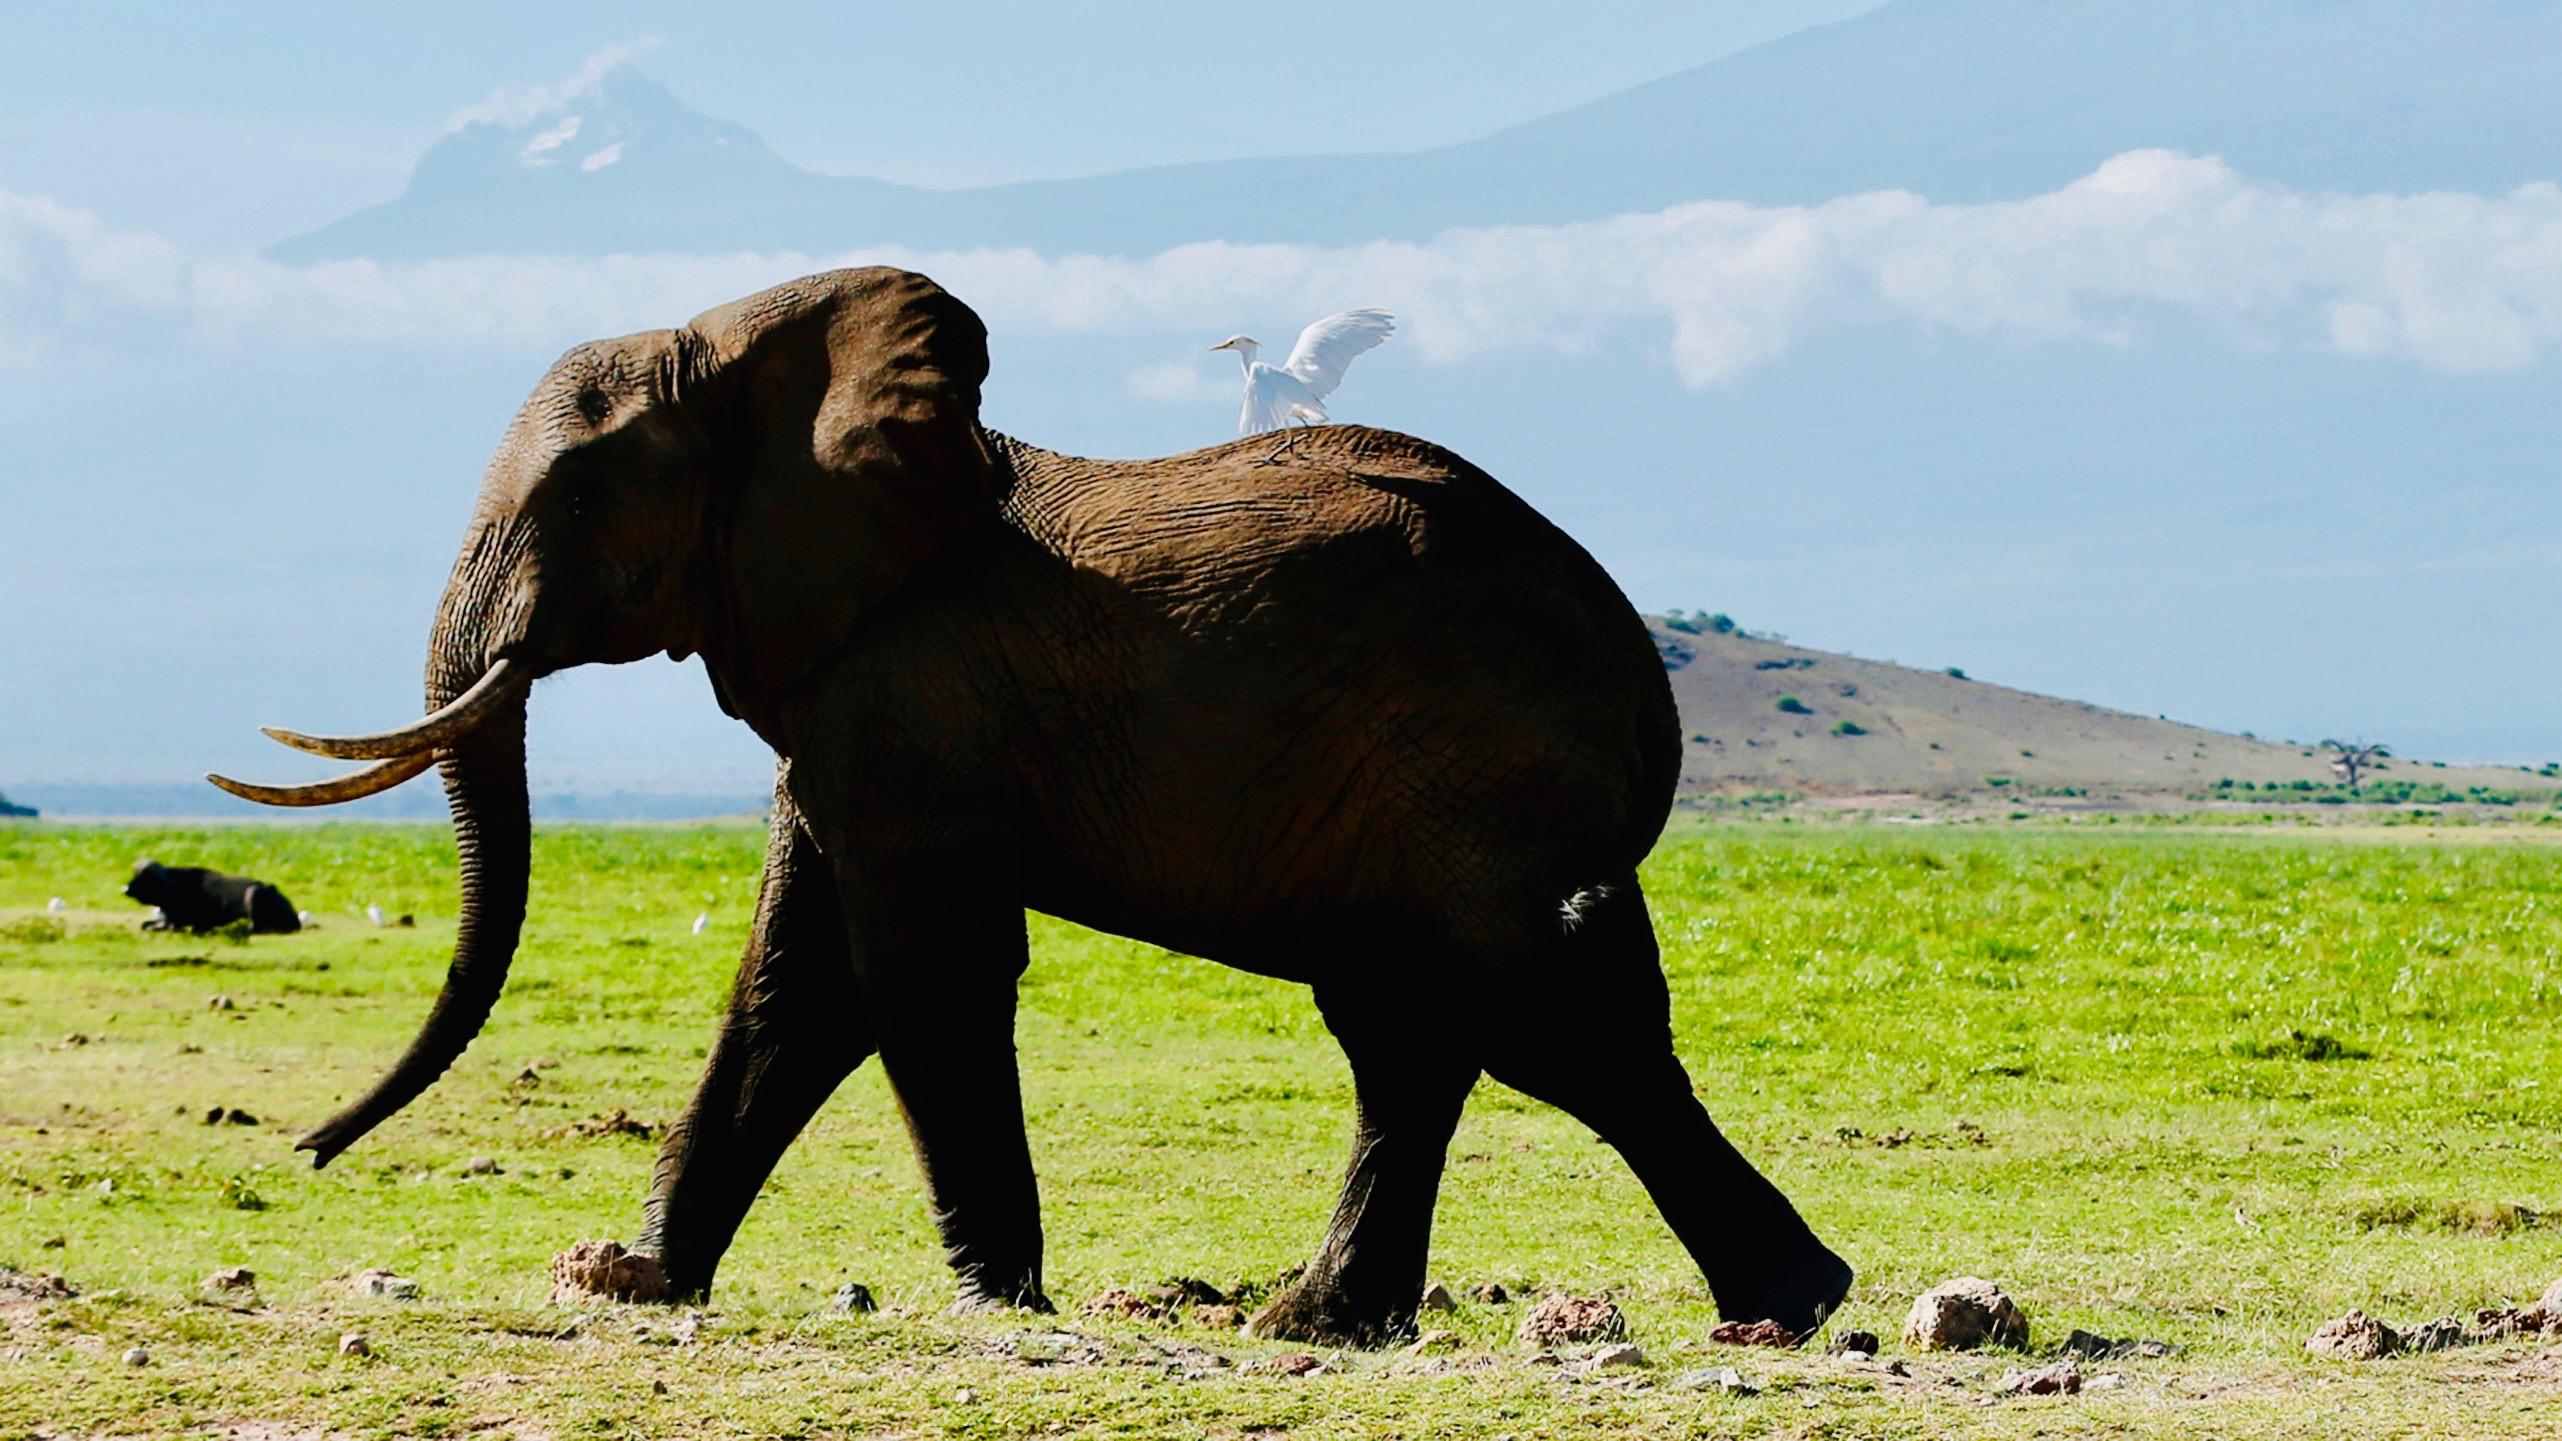 Celebrate World Elephant Day By Not Riding An Elephant Quartz